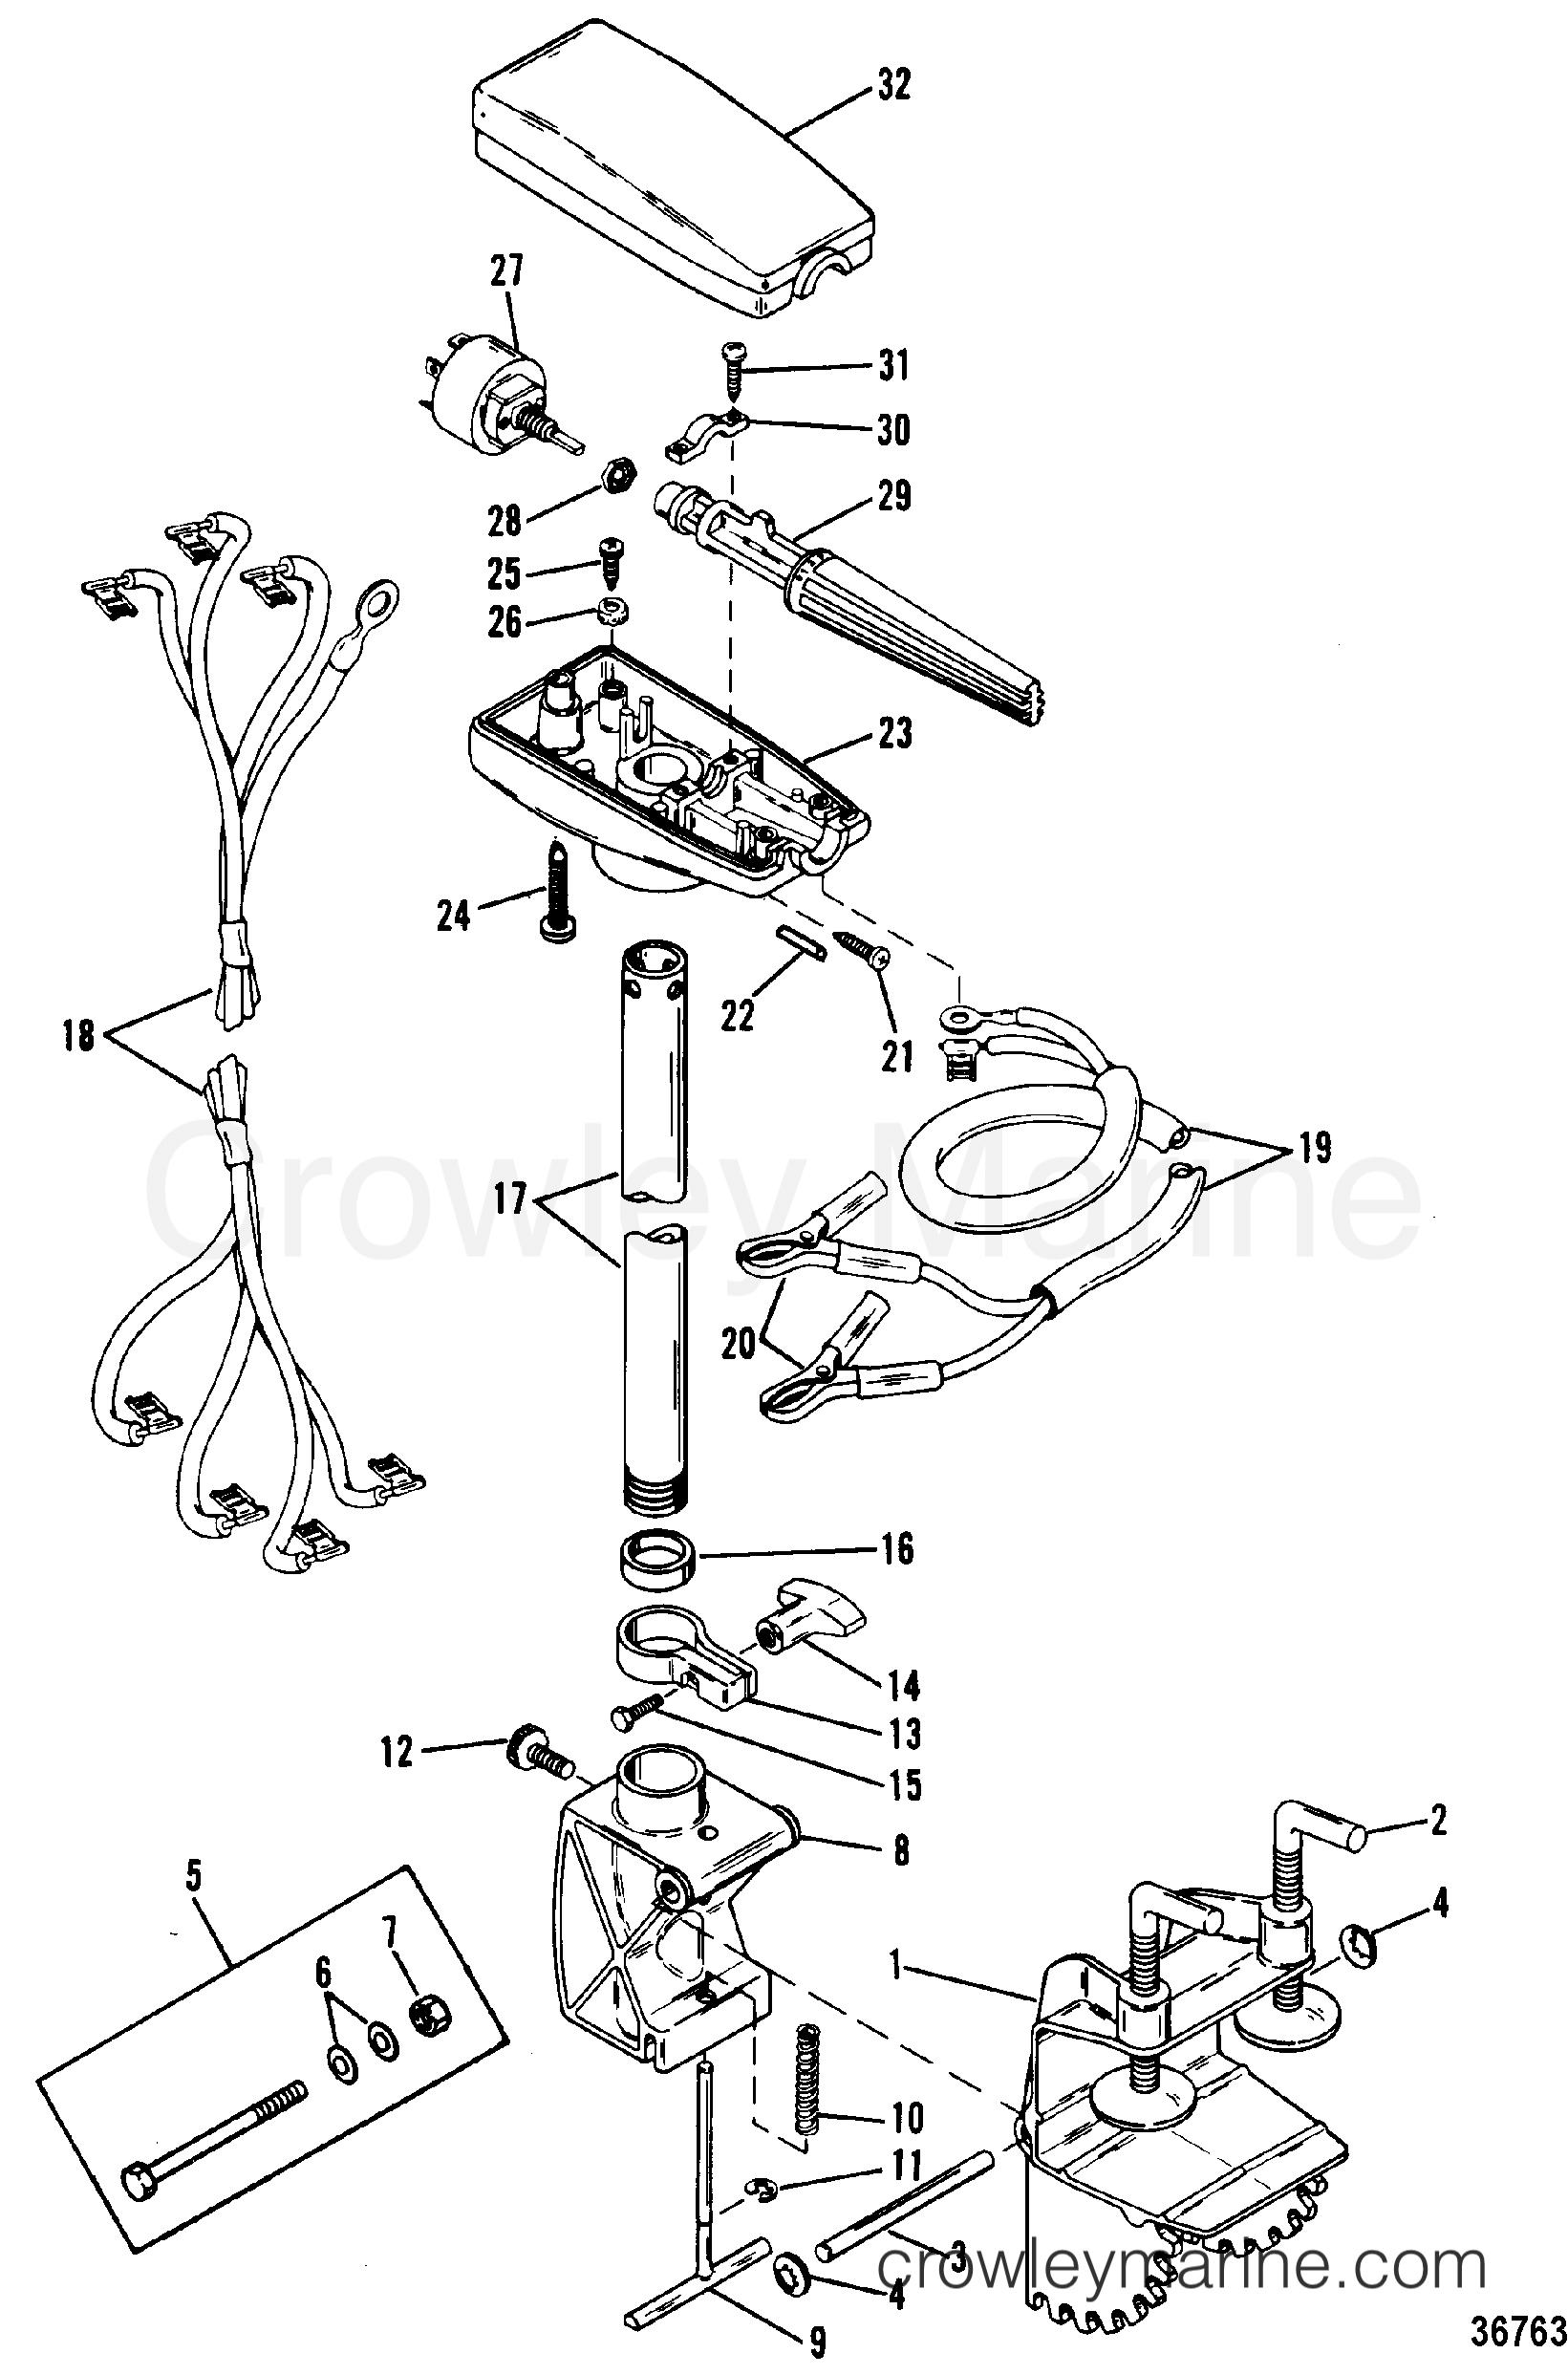 diagrams rotax engine diagram r